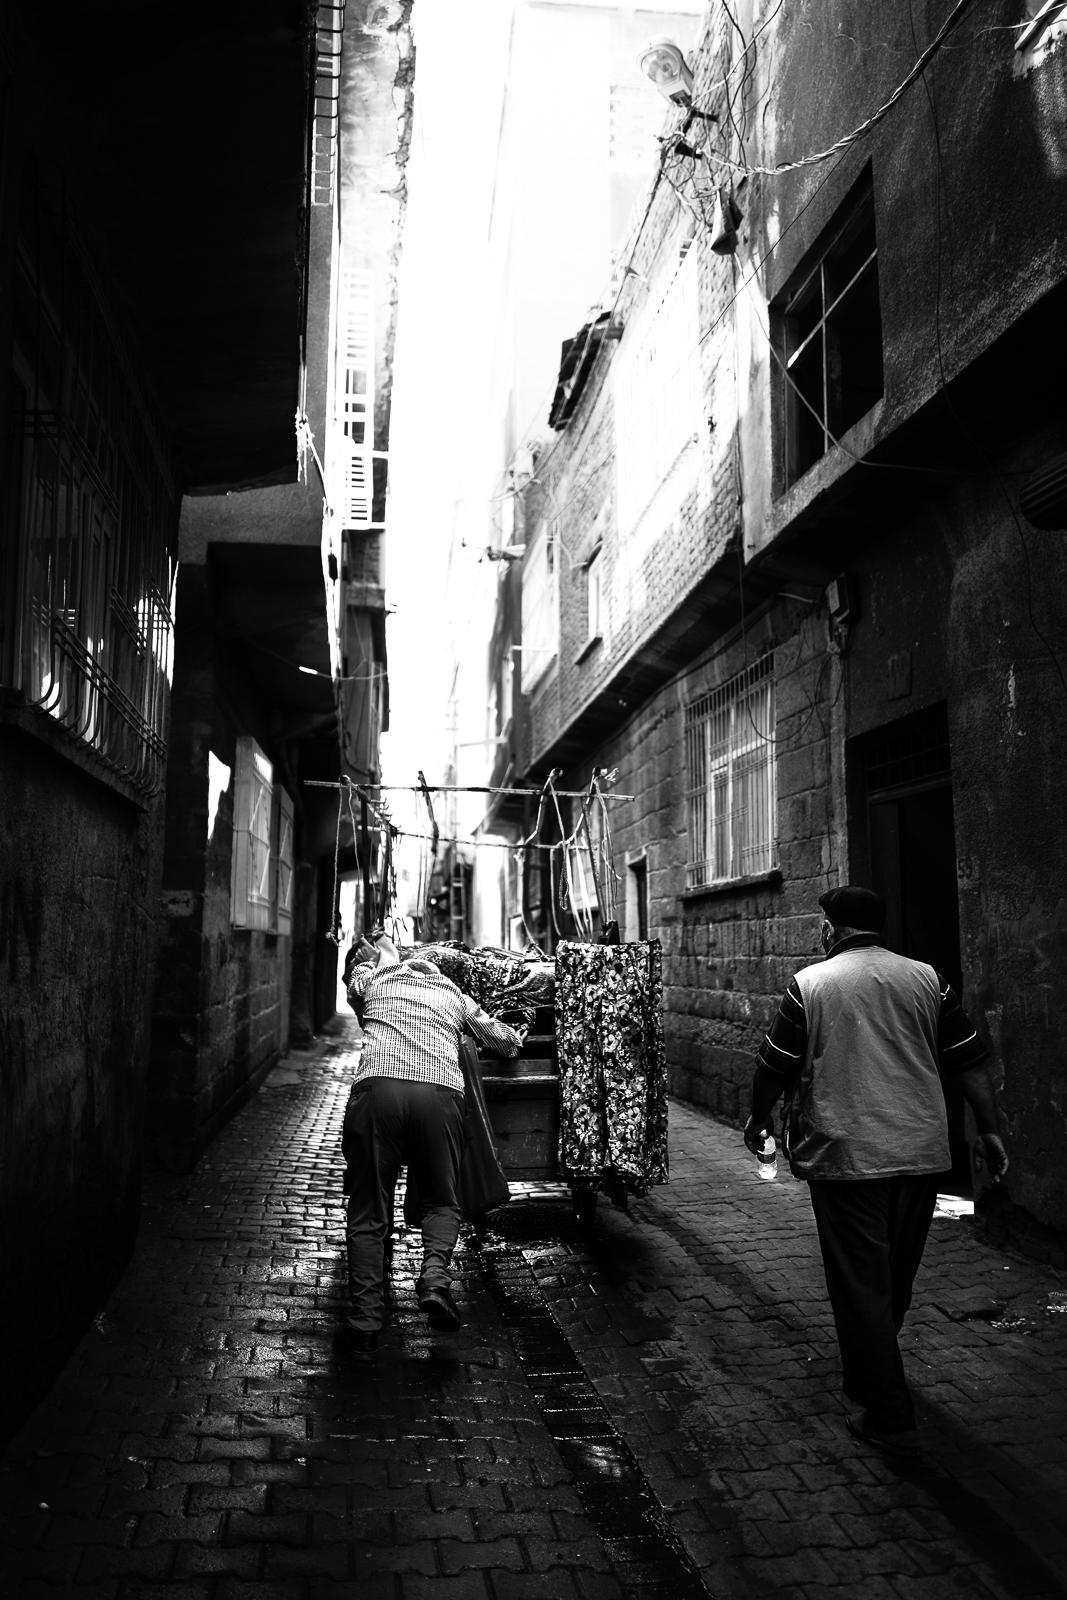 Bringing the goods to the bazaar, Diyarbakir (Turkey)